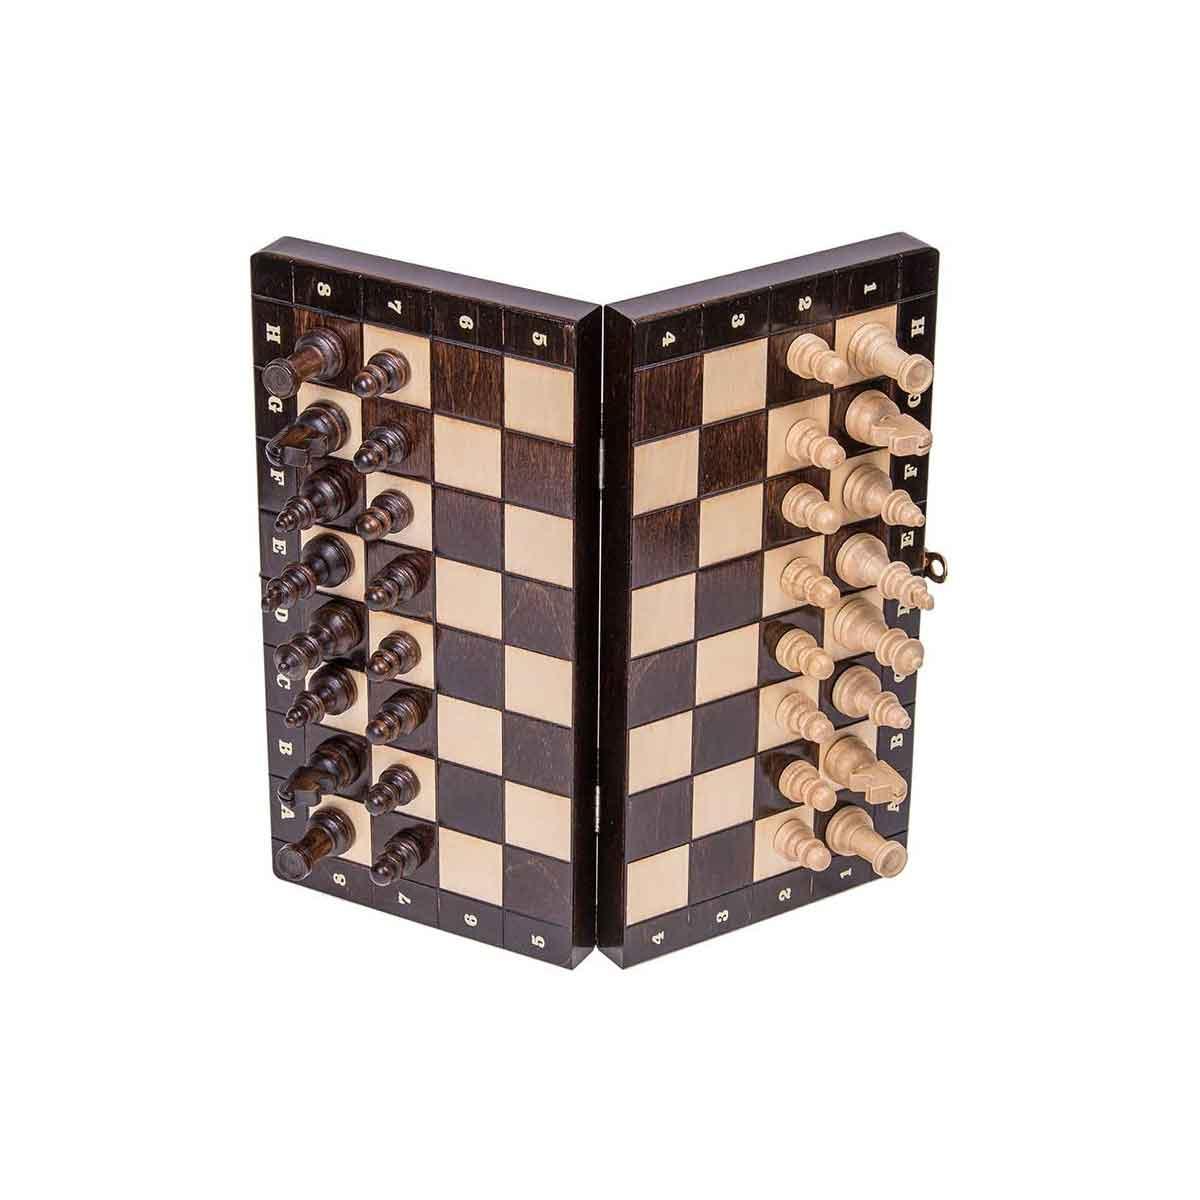 Square Magnético Haya-Abedul